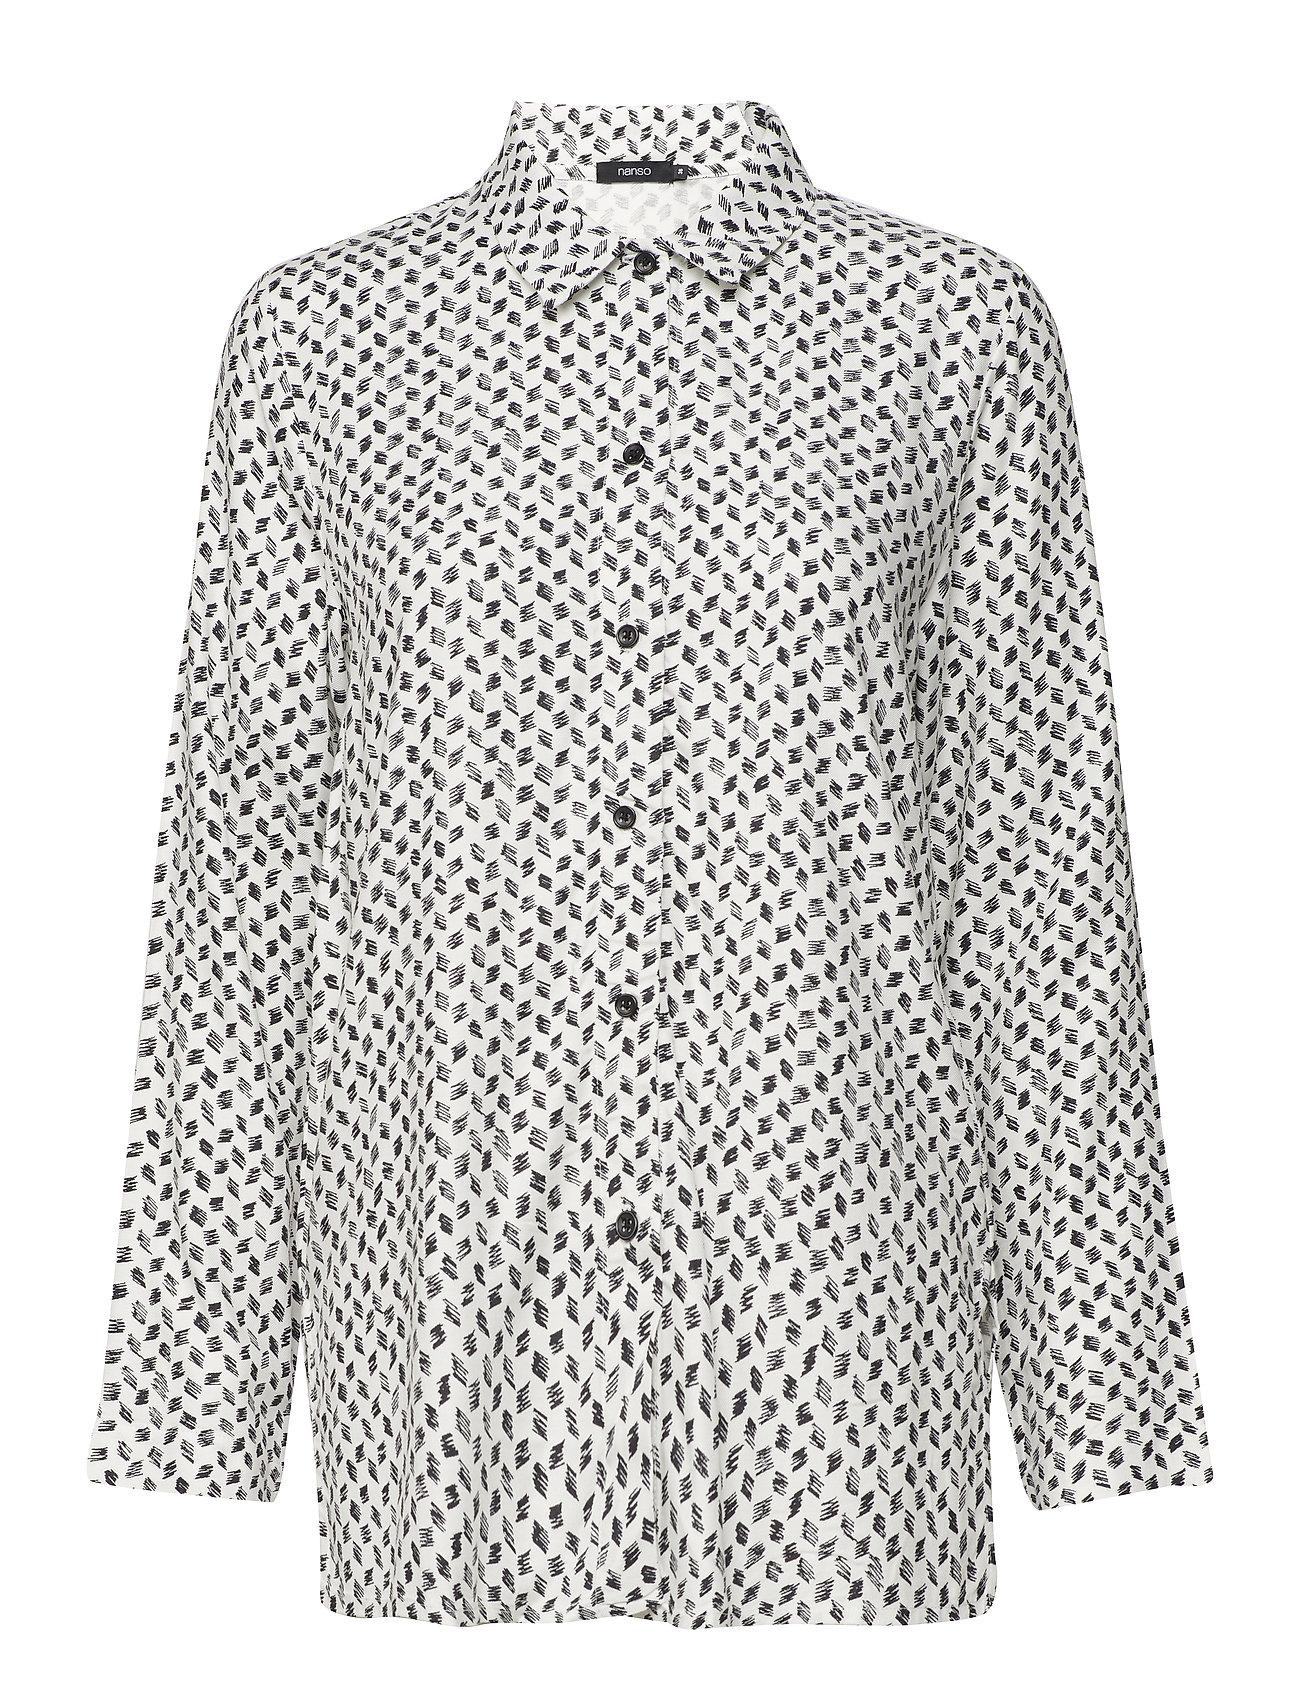 Nanso Ladies shirt, Vinoruutu - WHITE